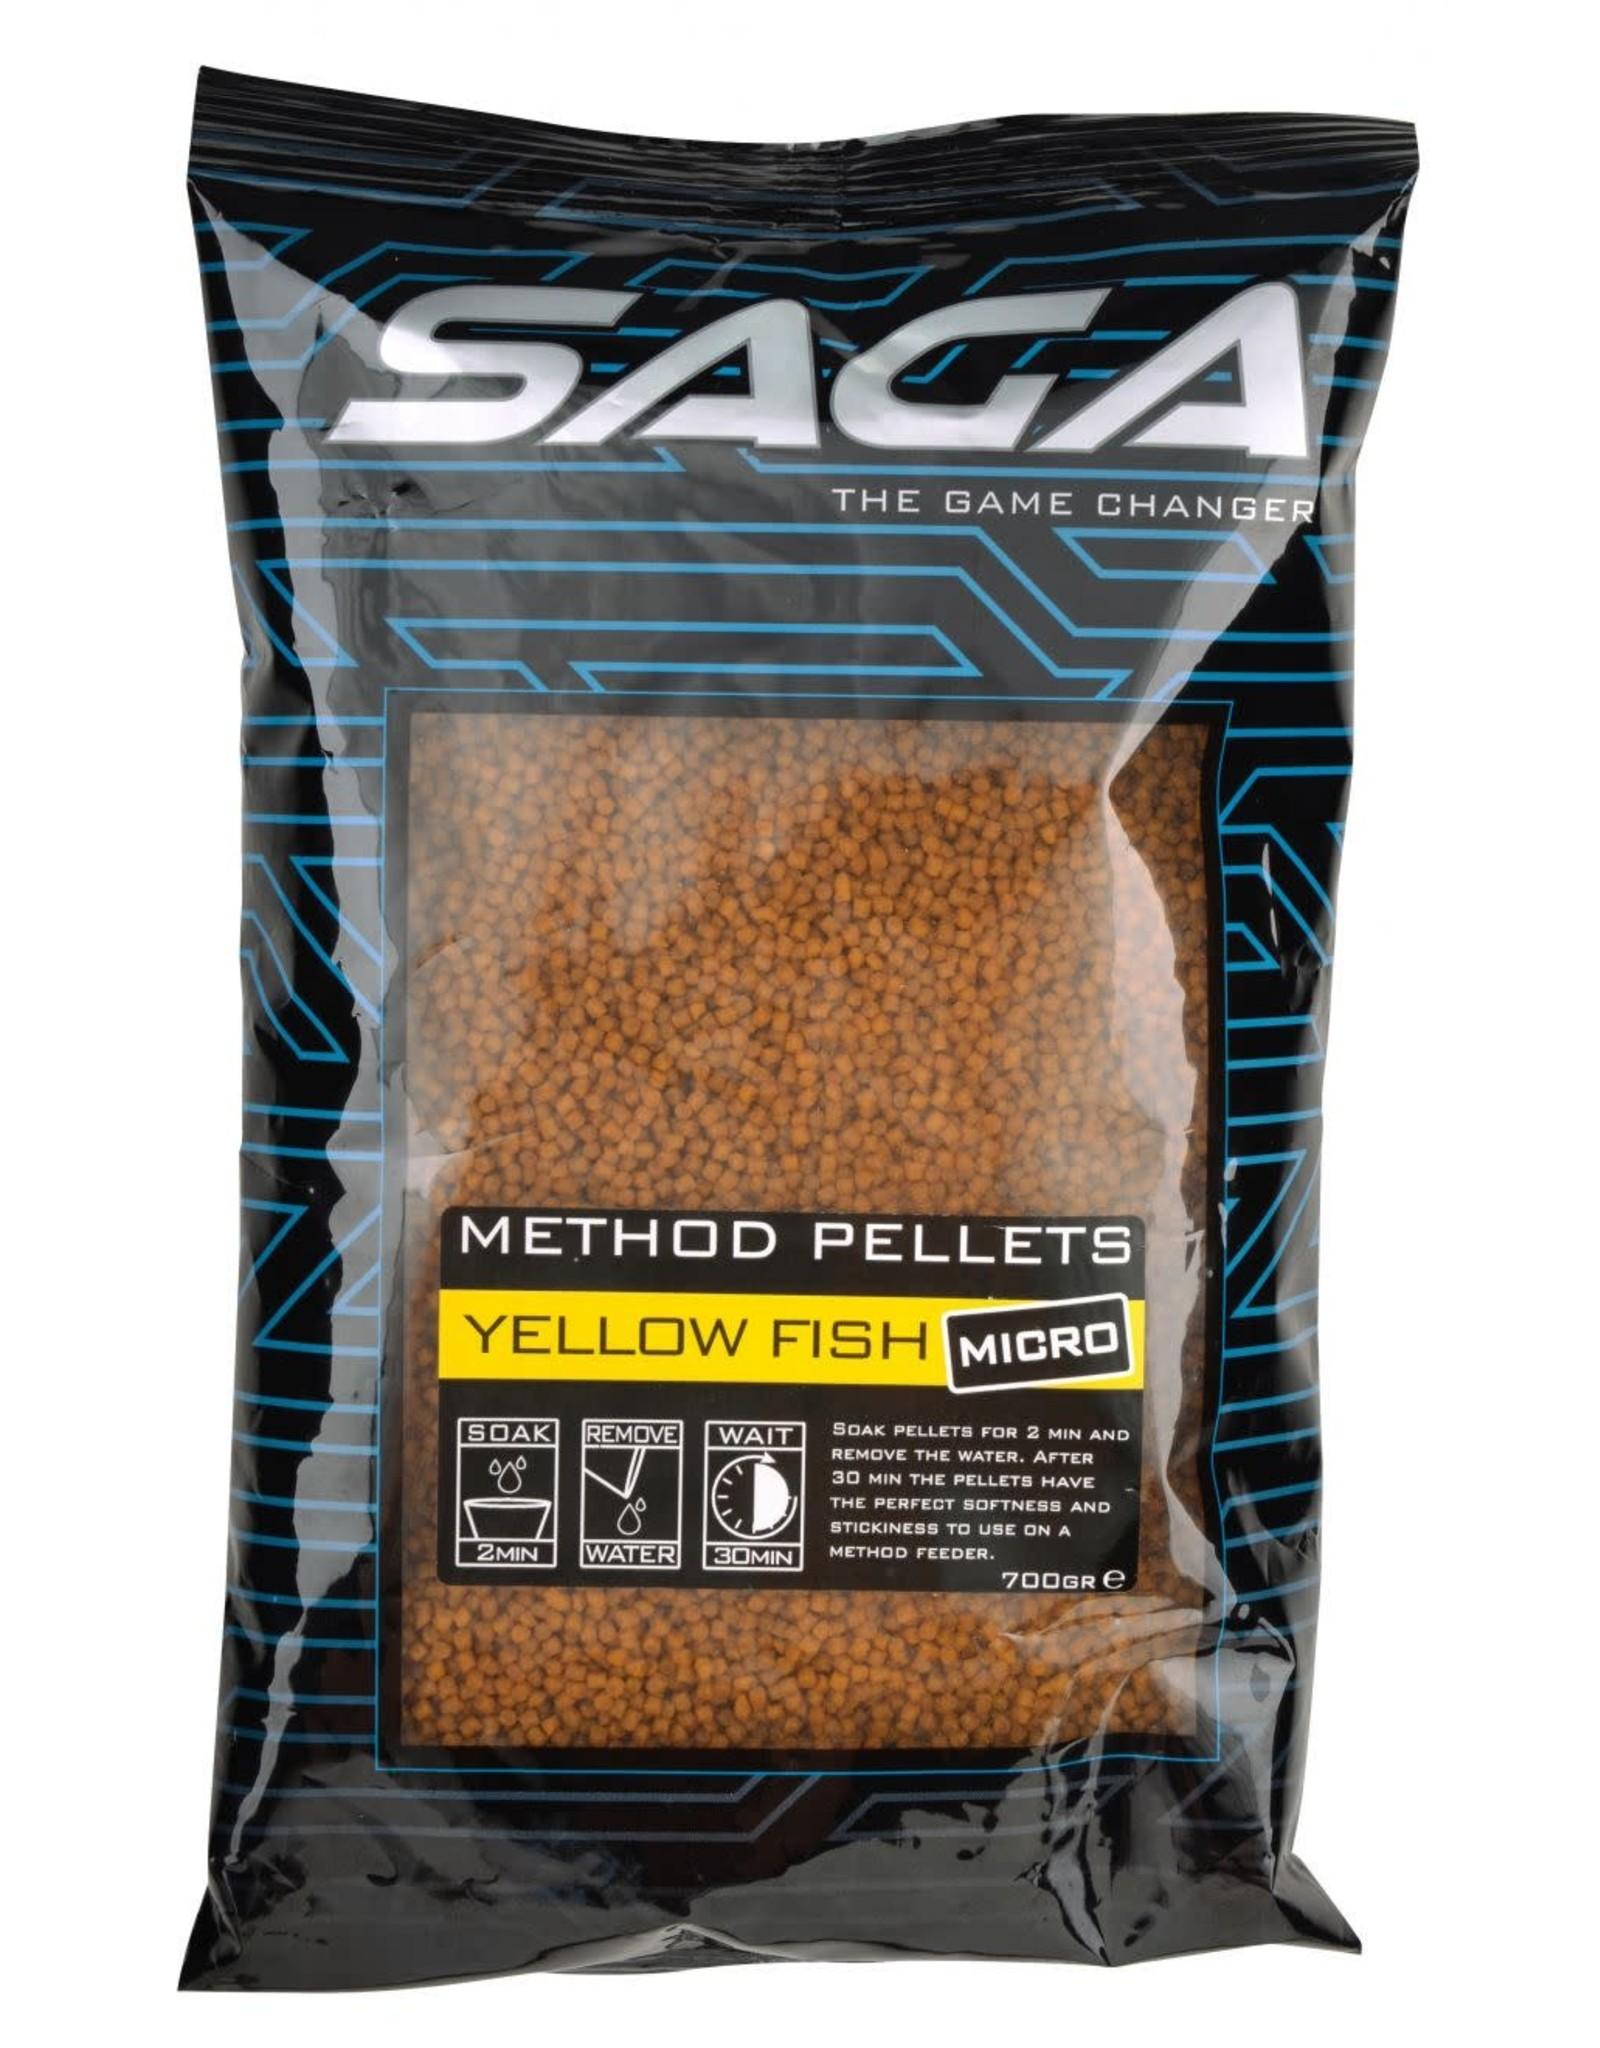 SAGA METHOD PELLETS YELLOW FISH MICRO 2MM 700G